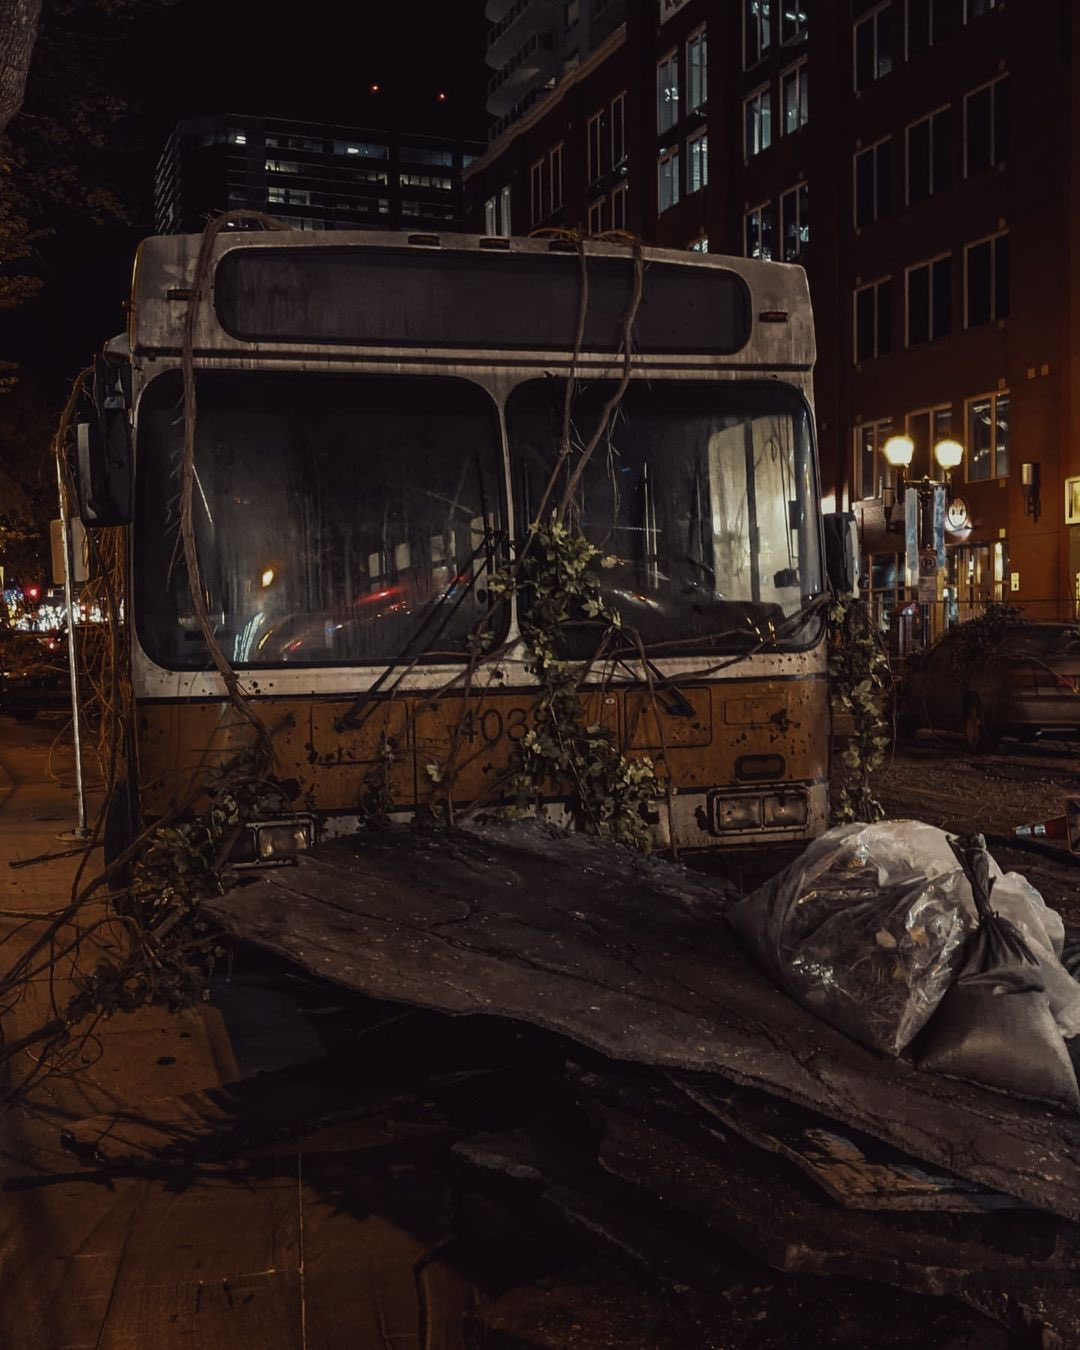 Видео и фото Педро Паскаля и различных декораций со съемок шоу по The Last of Us